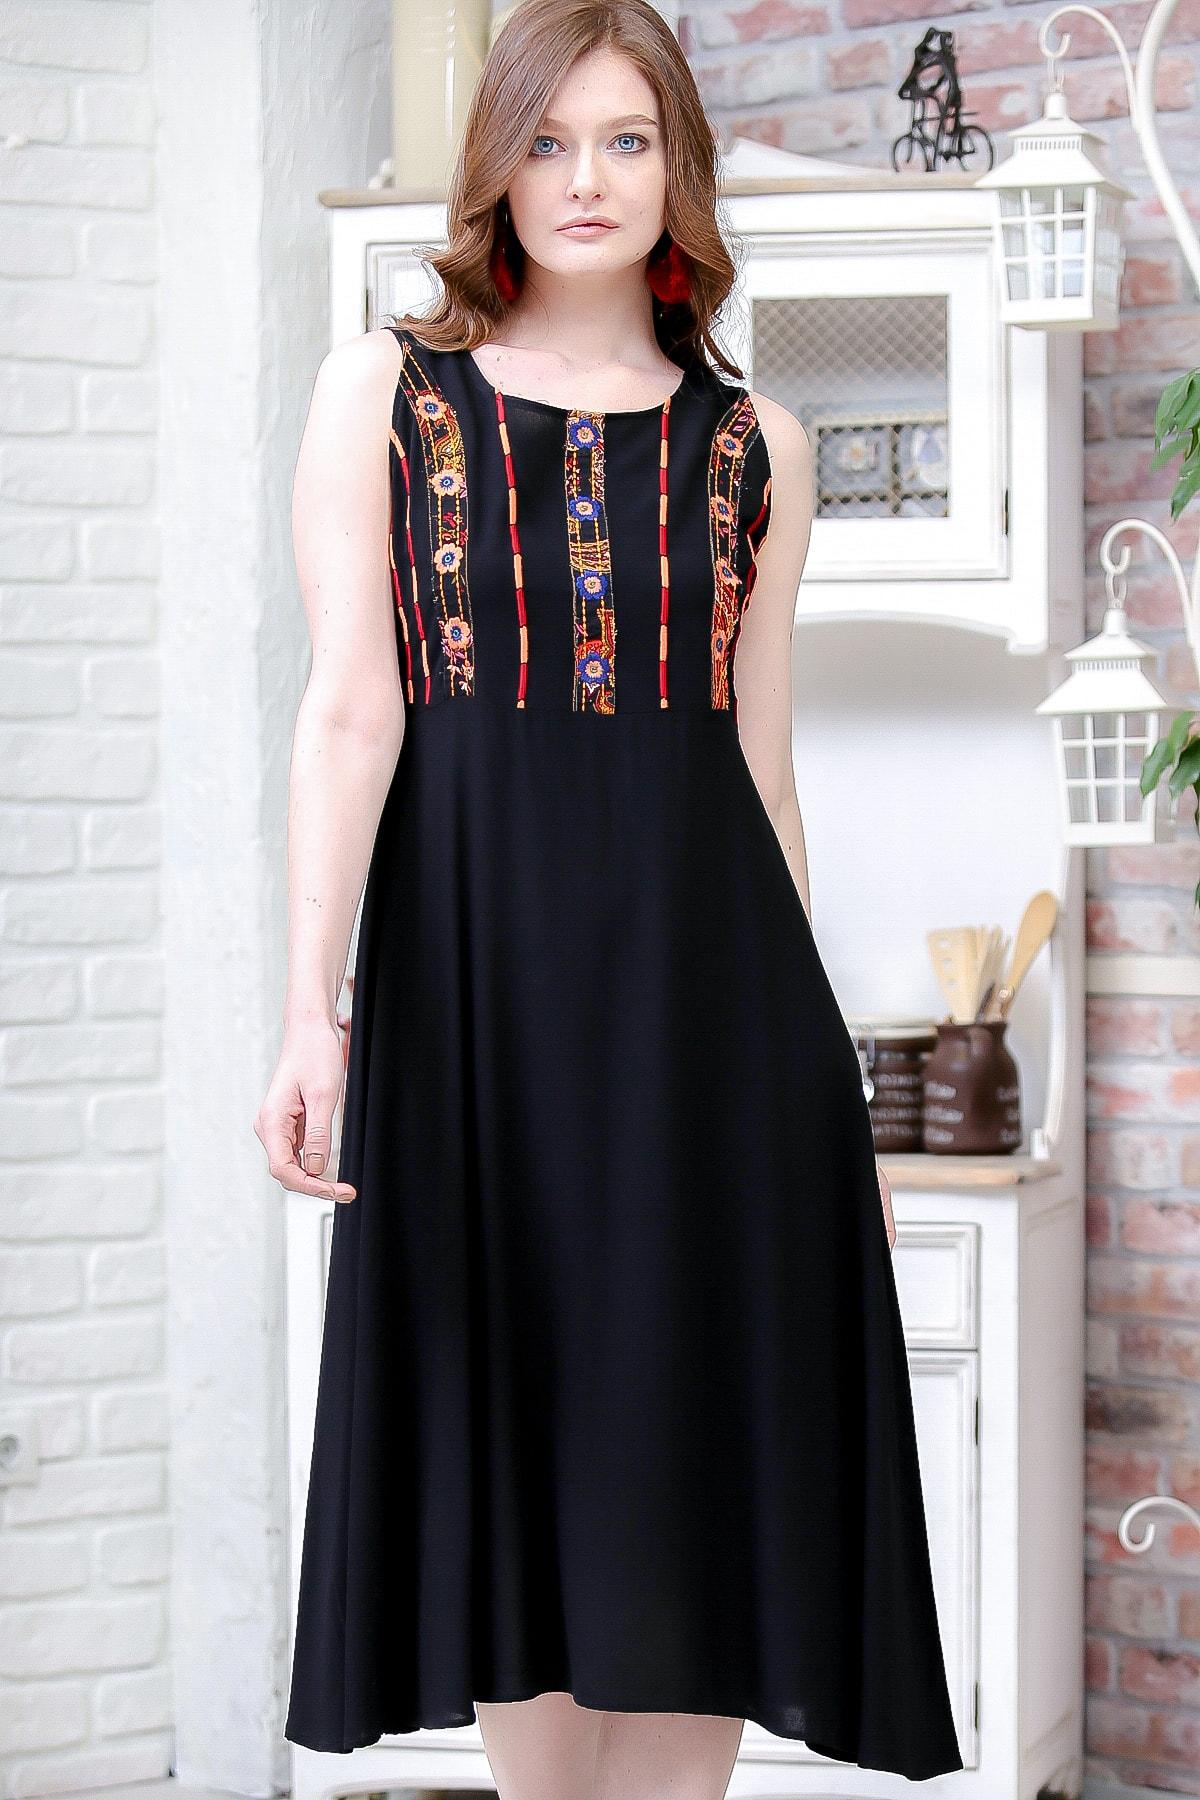 Chiccy Kadın Siyah Bohem Robası Tribal Nakış Detaylı Elbise M10160000EL97164